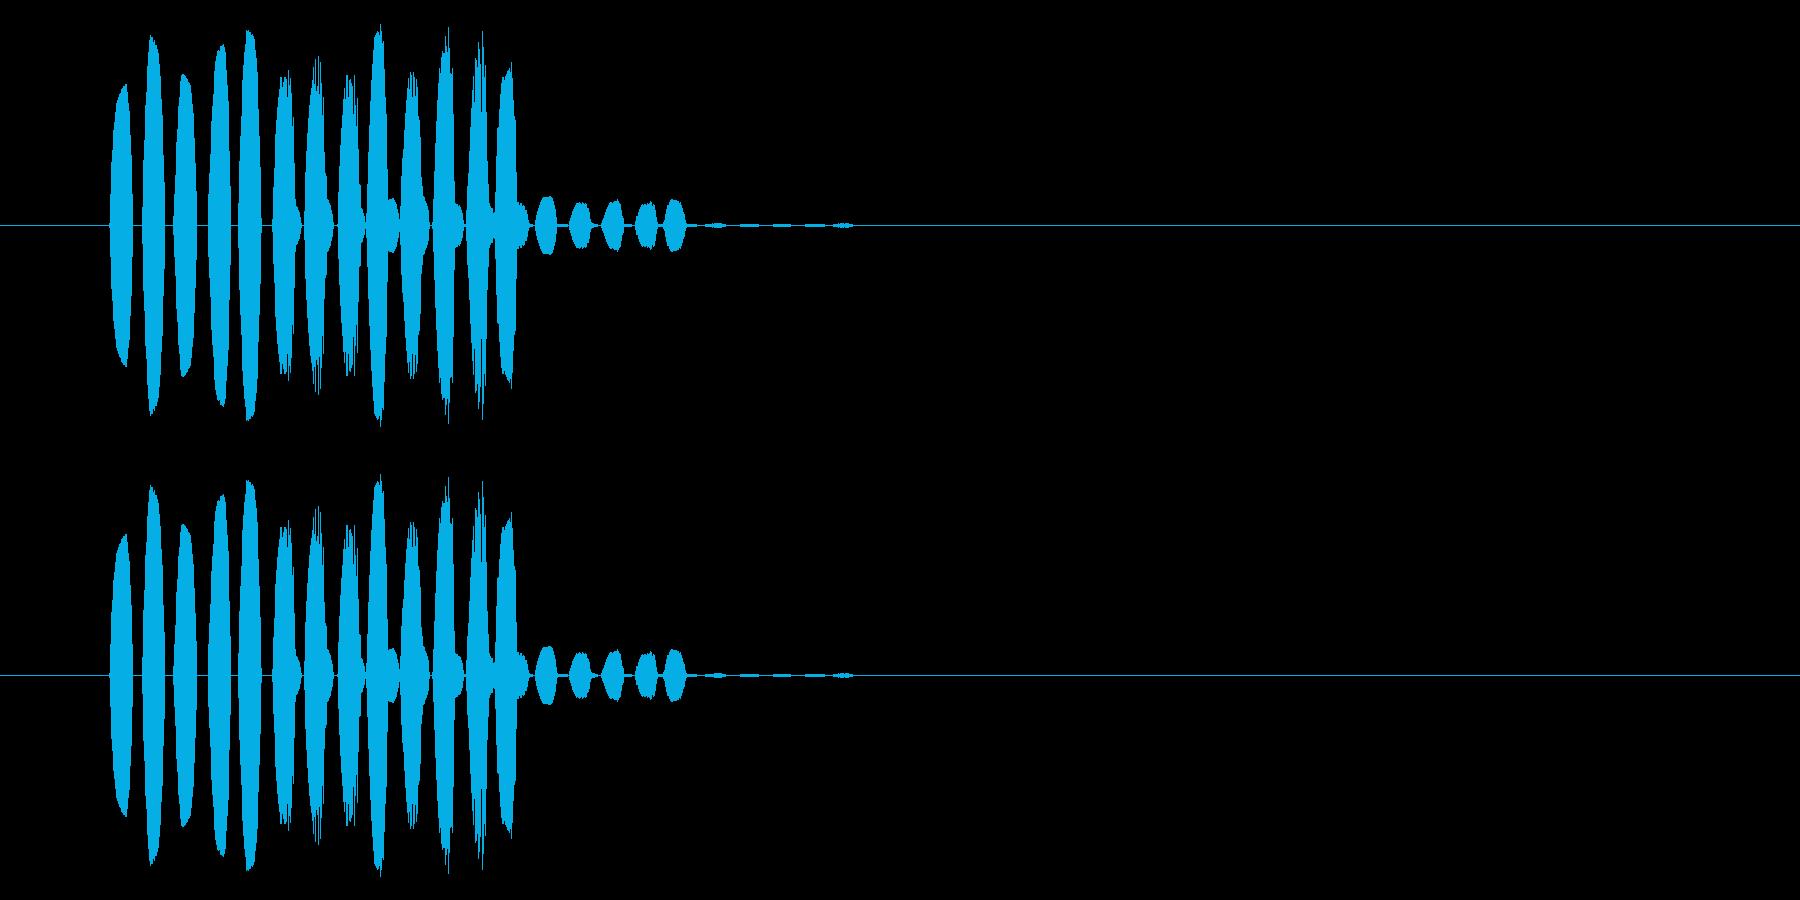 SNES-RPG04-14(魔法 状態)の再生済みの波形